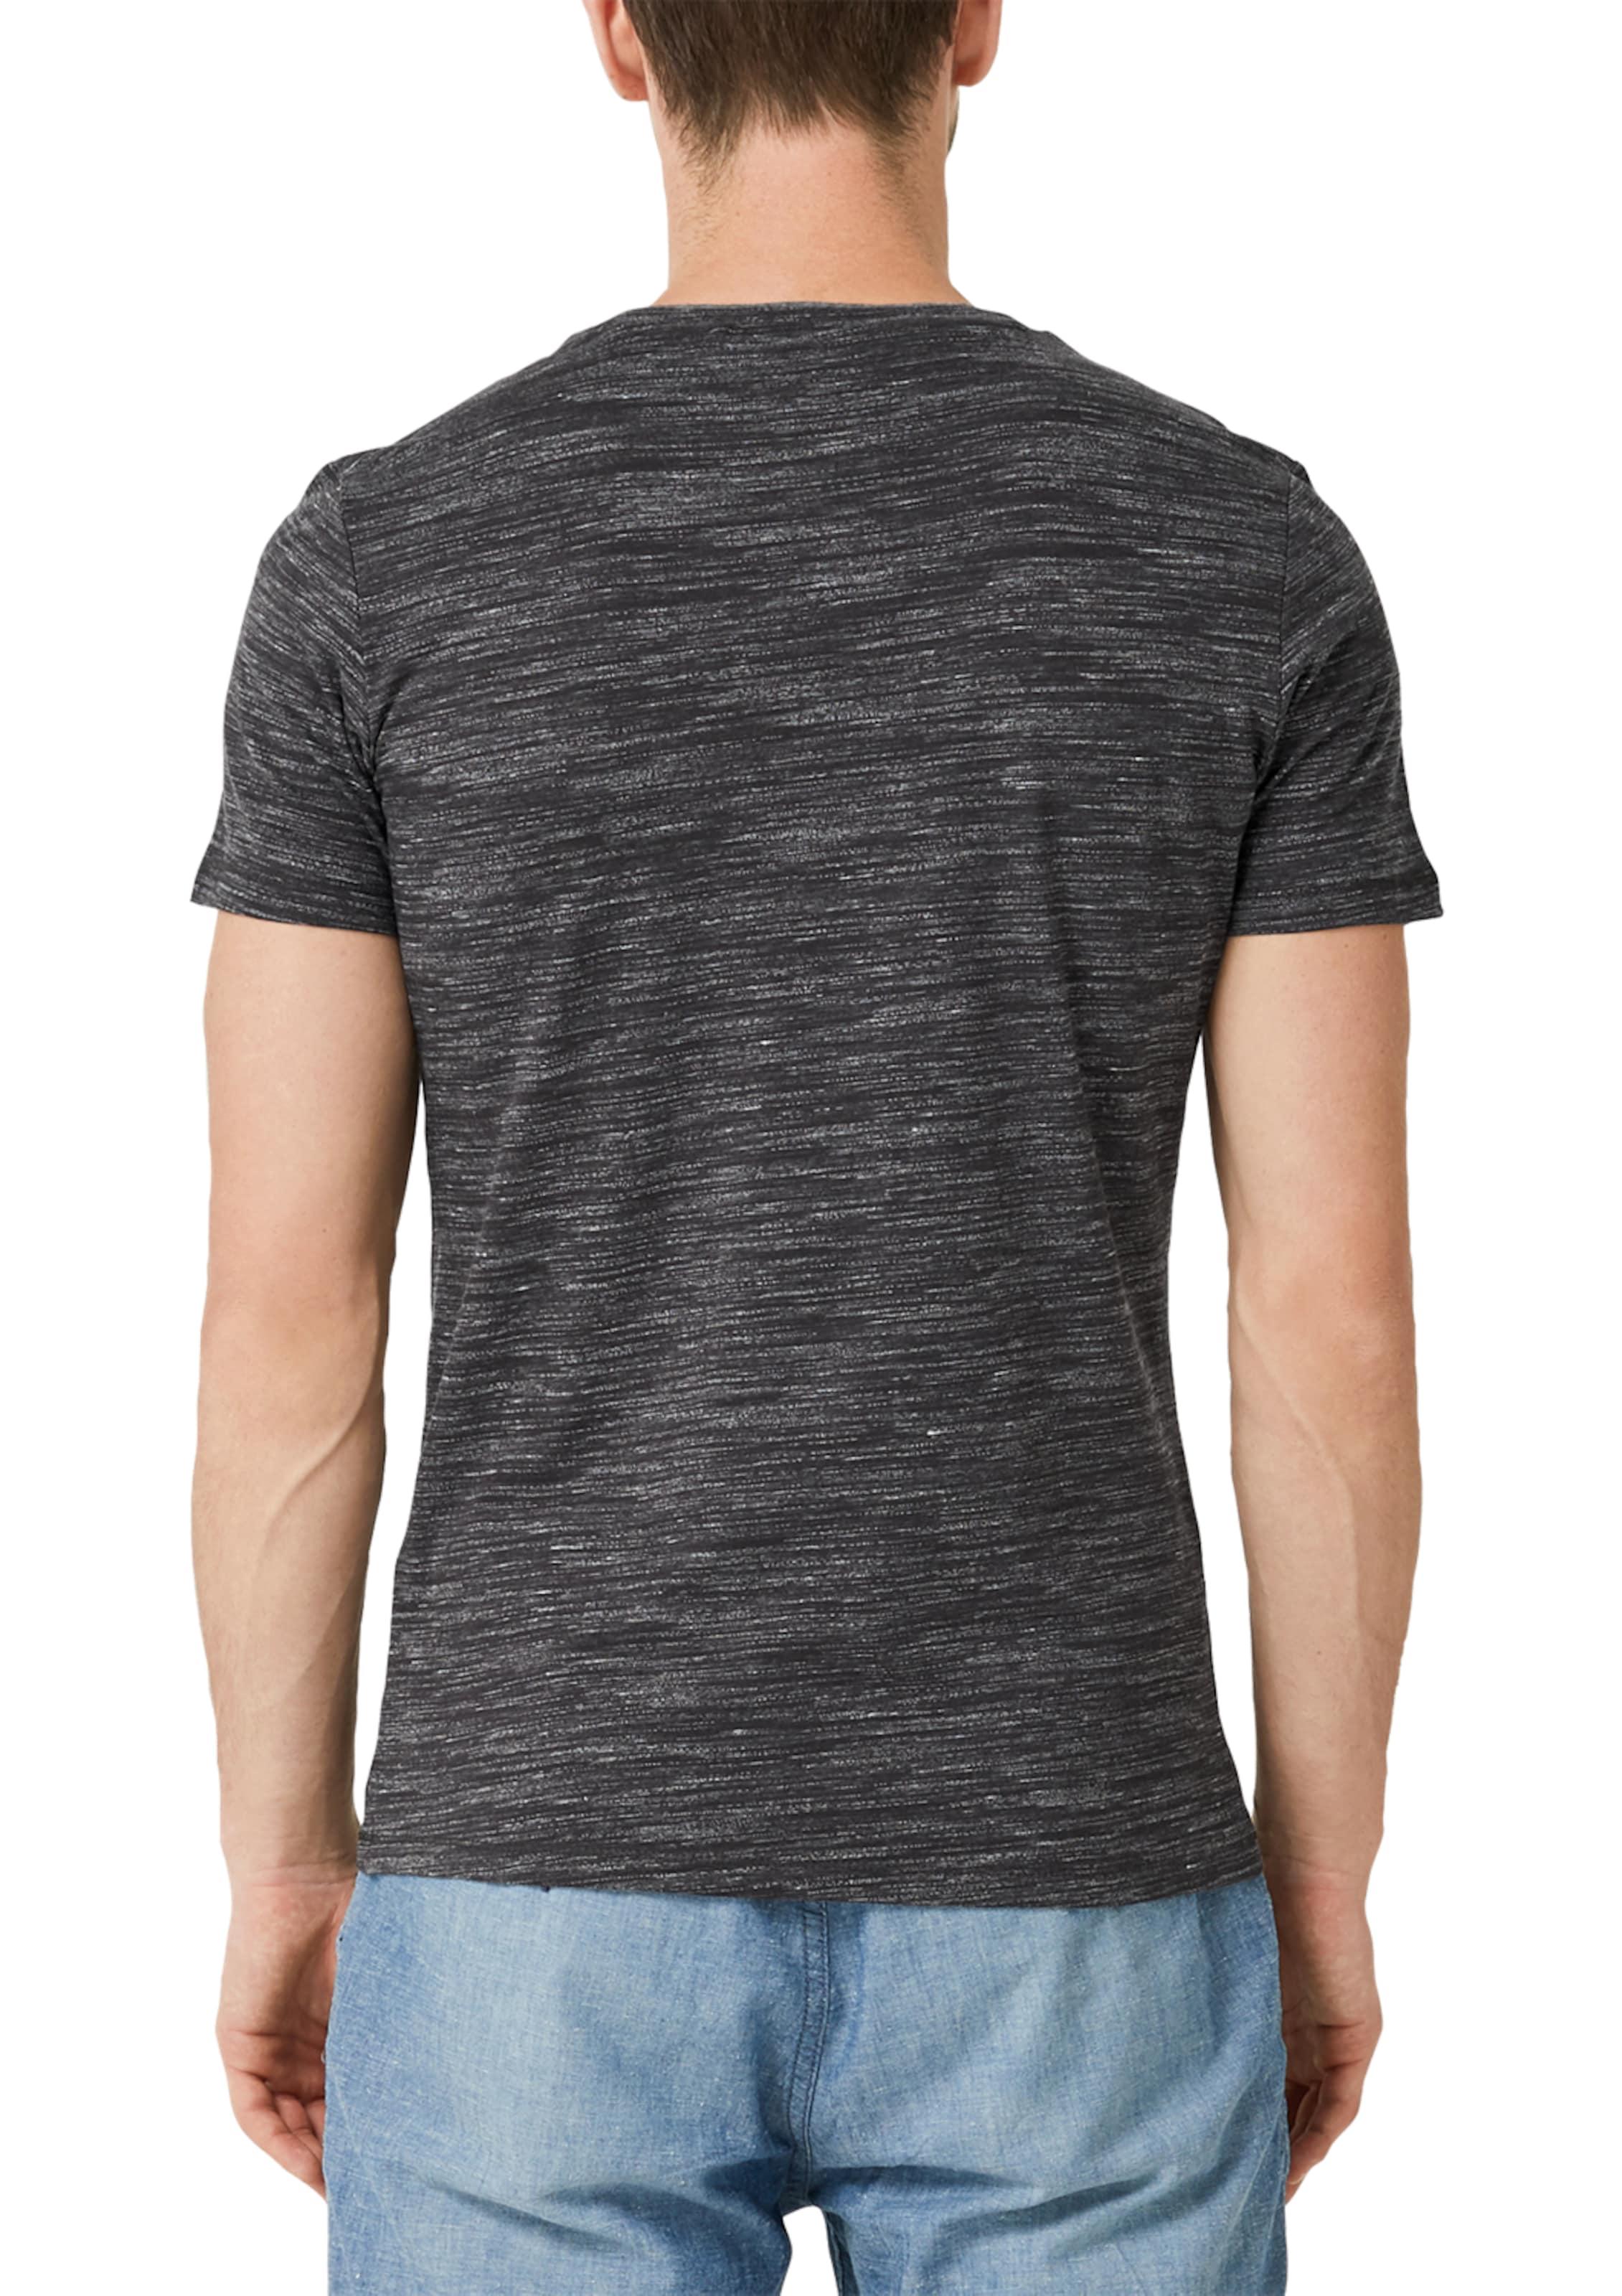 T Schwarz shirt oliver In S LR5Aj4